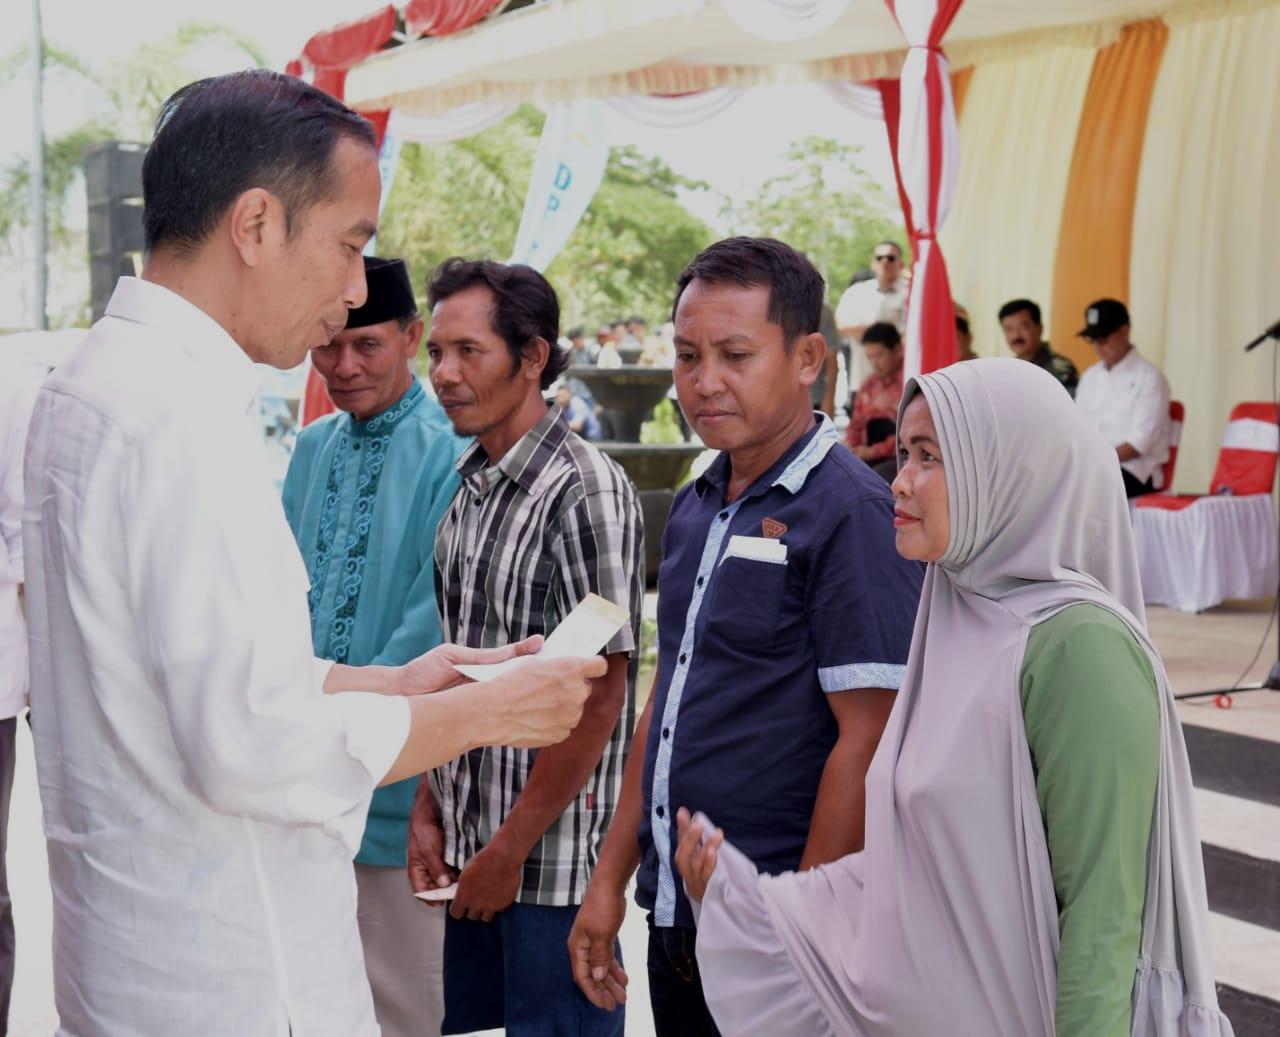 Kementerian Komunikasi Dan Informatika Rumah Untuk Keluarga Gempa Lombok Lebih Dari 5 Ribu Korban Terima Bantuan Pembangunan